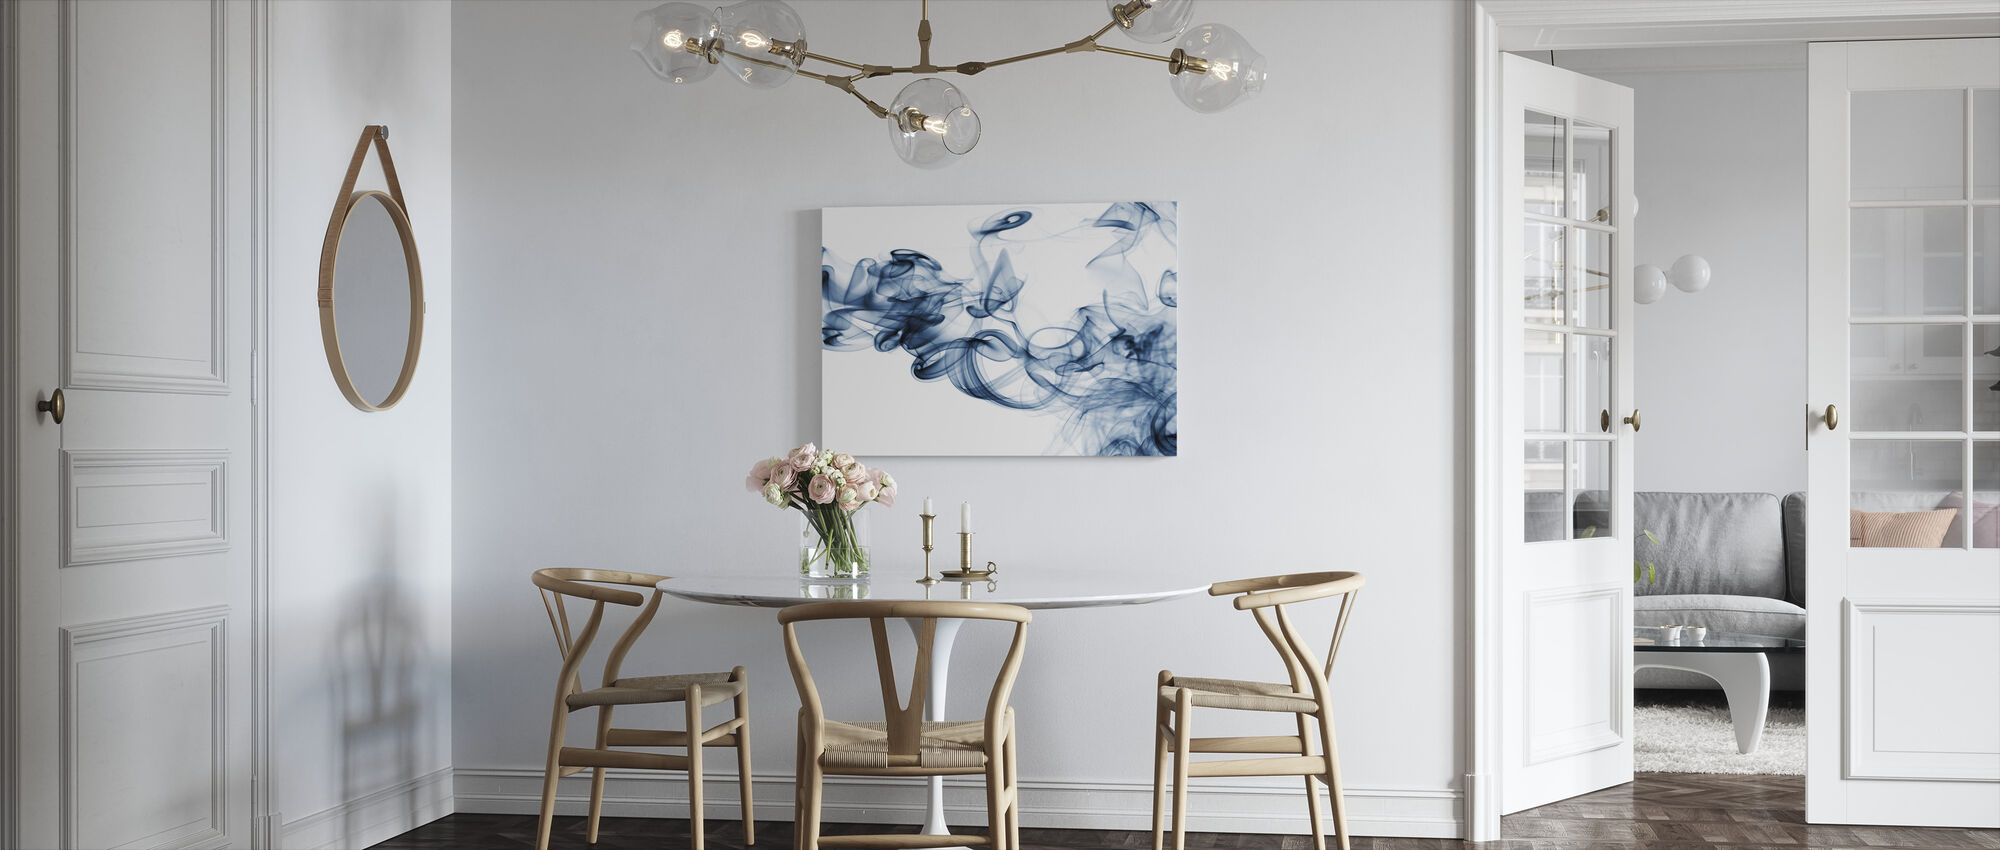 Stromen van rook - Canvas print - Keuken